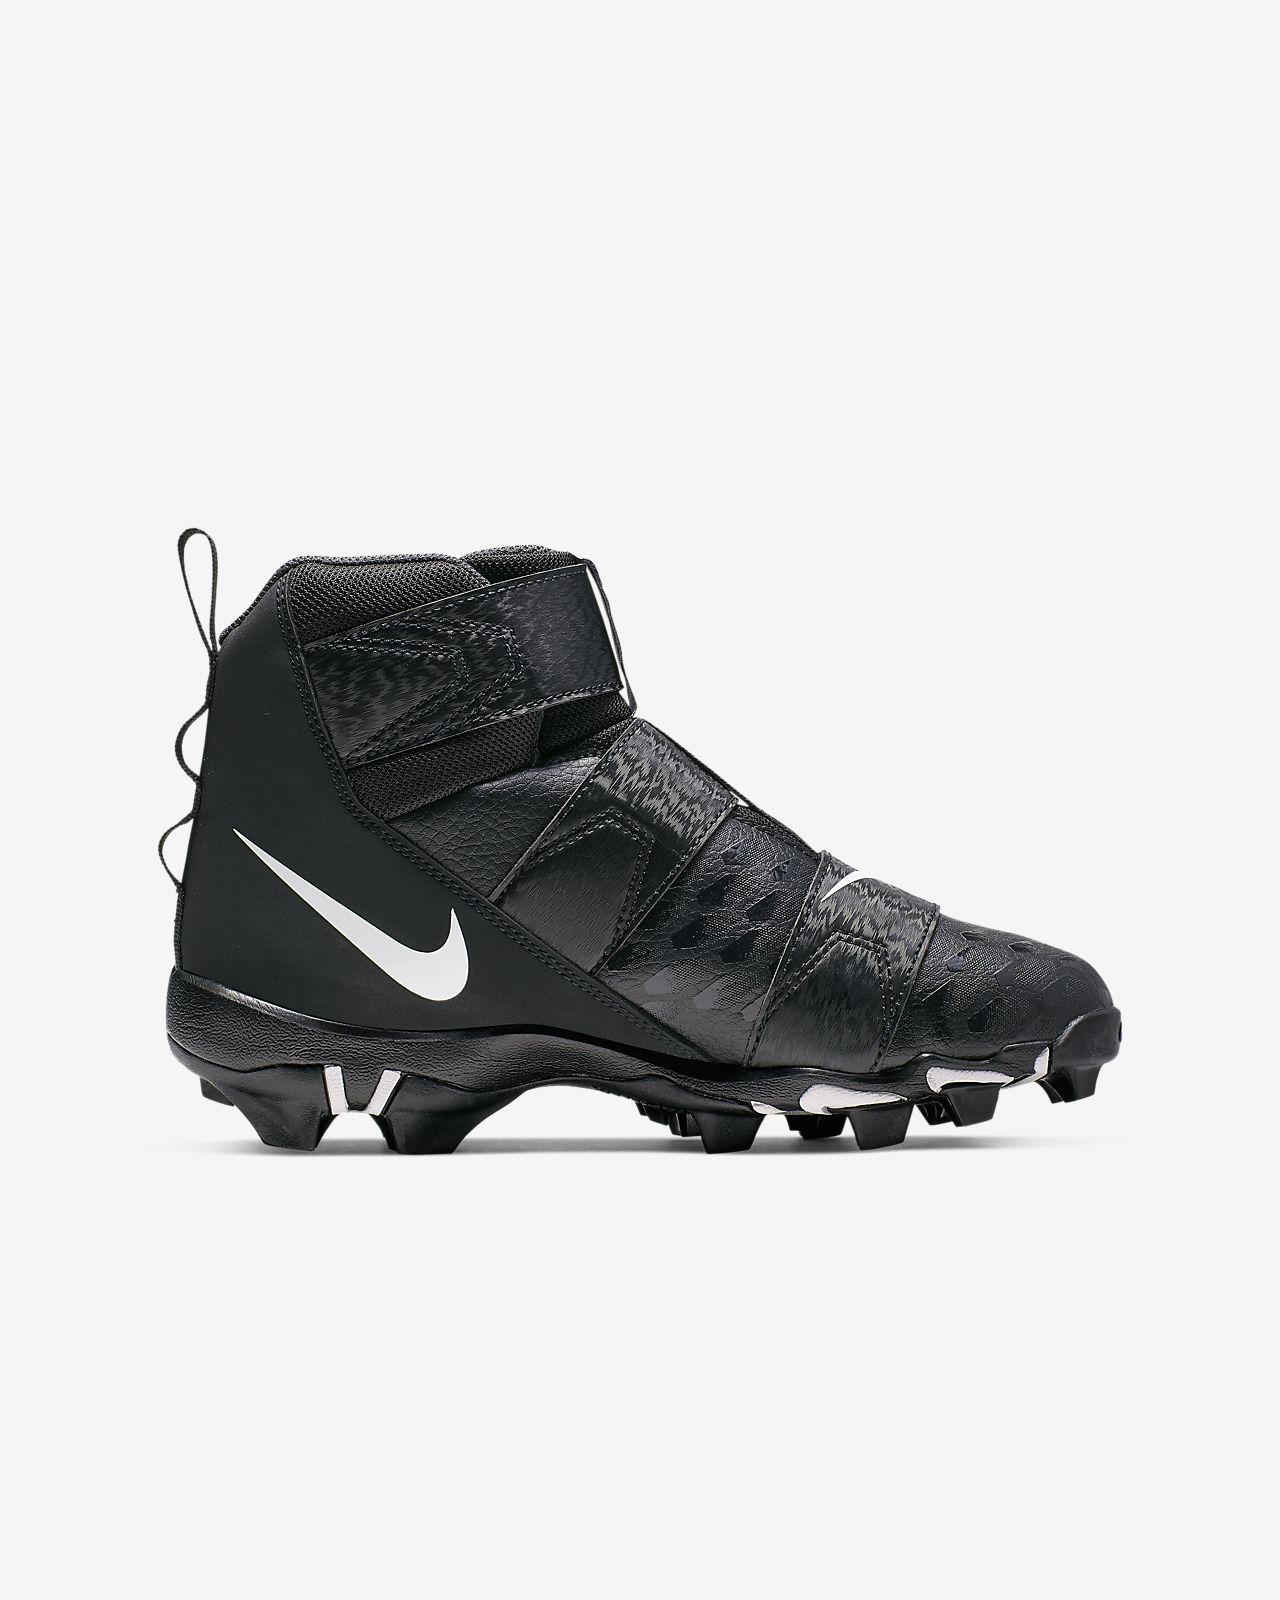 805c0f46e892 ... Nike Force Savage Shark 2 Little/Big Kids' Football Cleat (Wide)